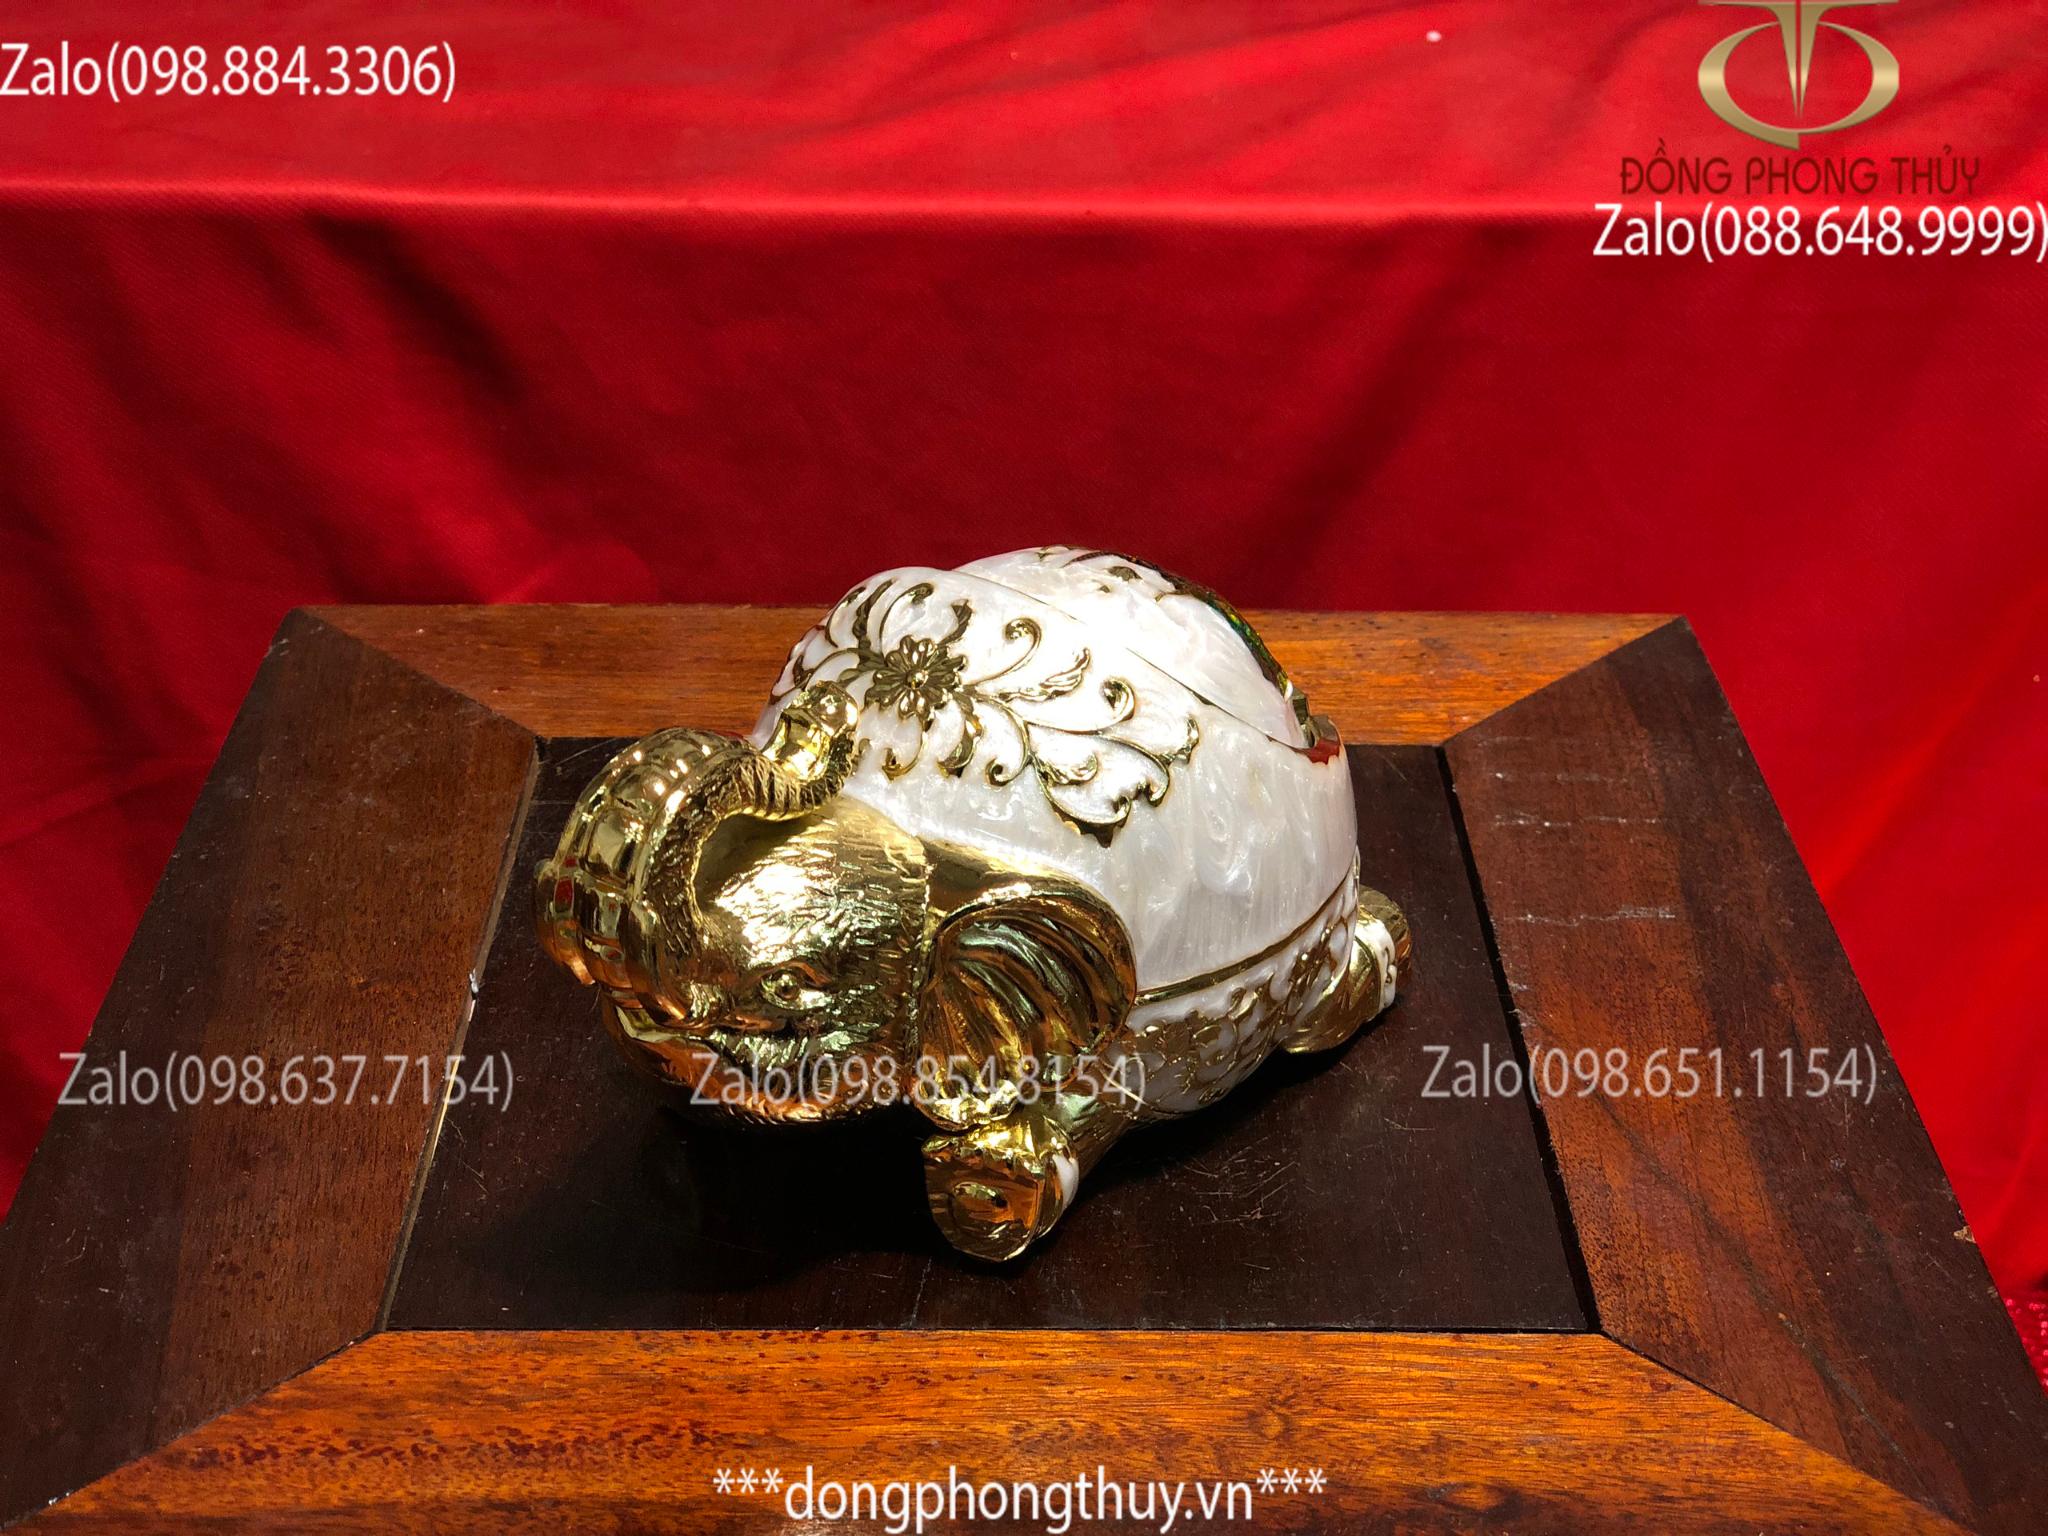 Gạt tàn voi